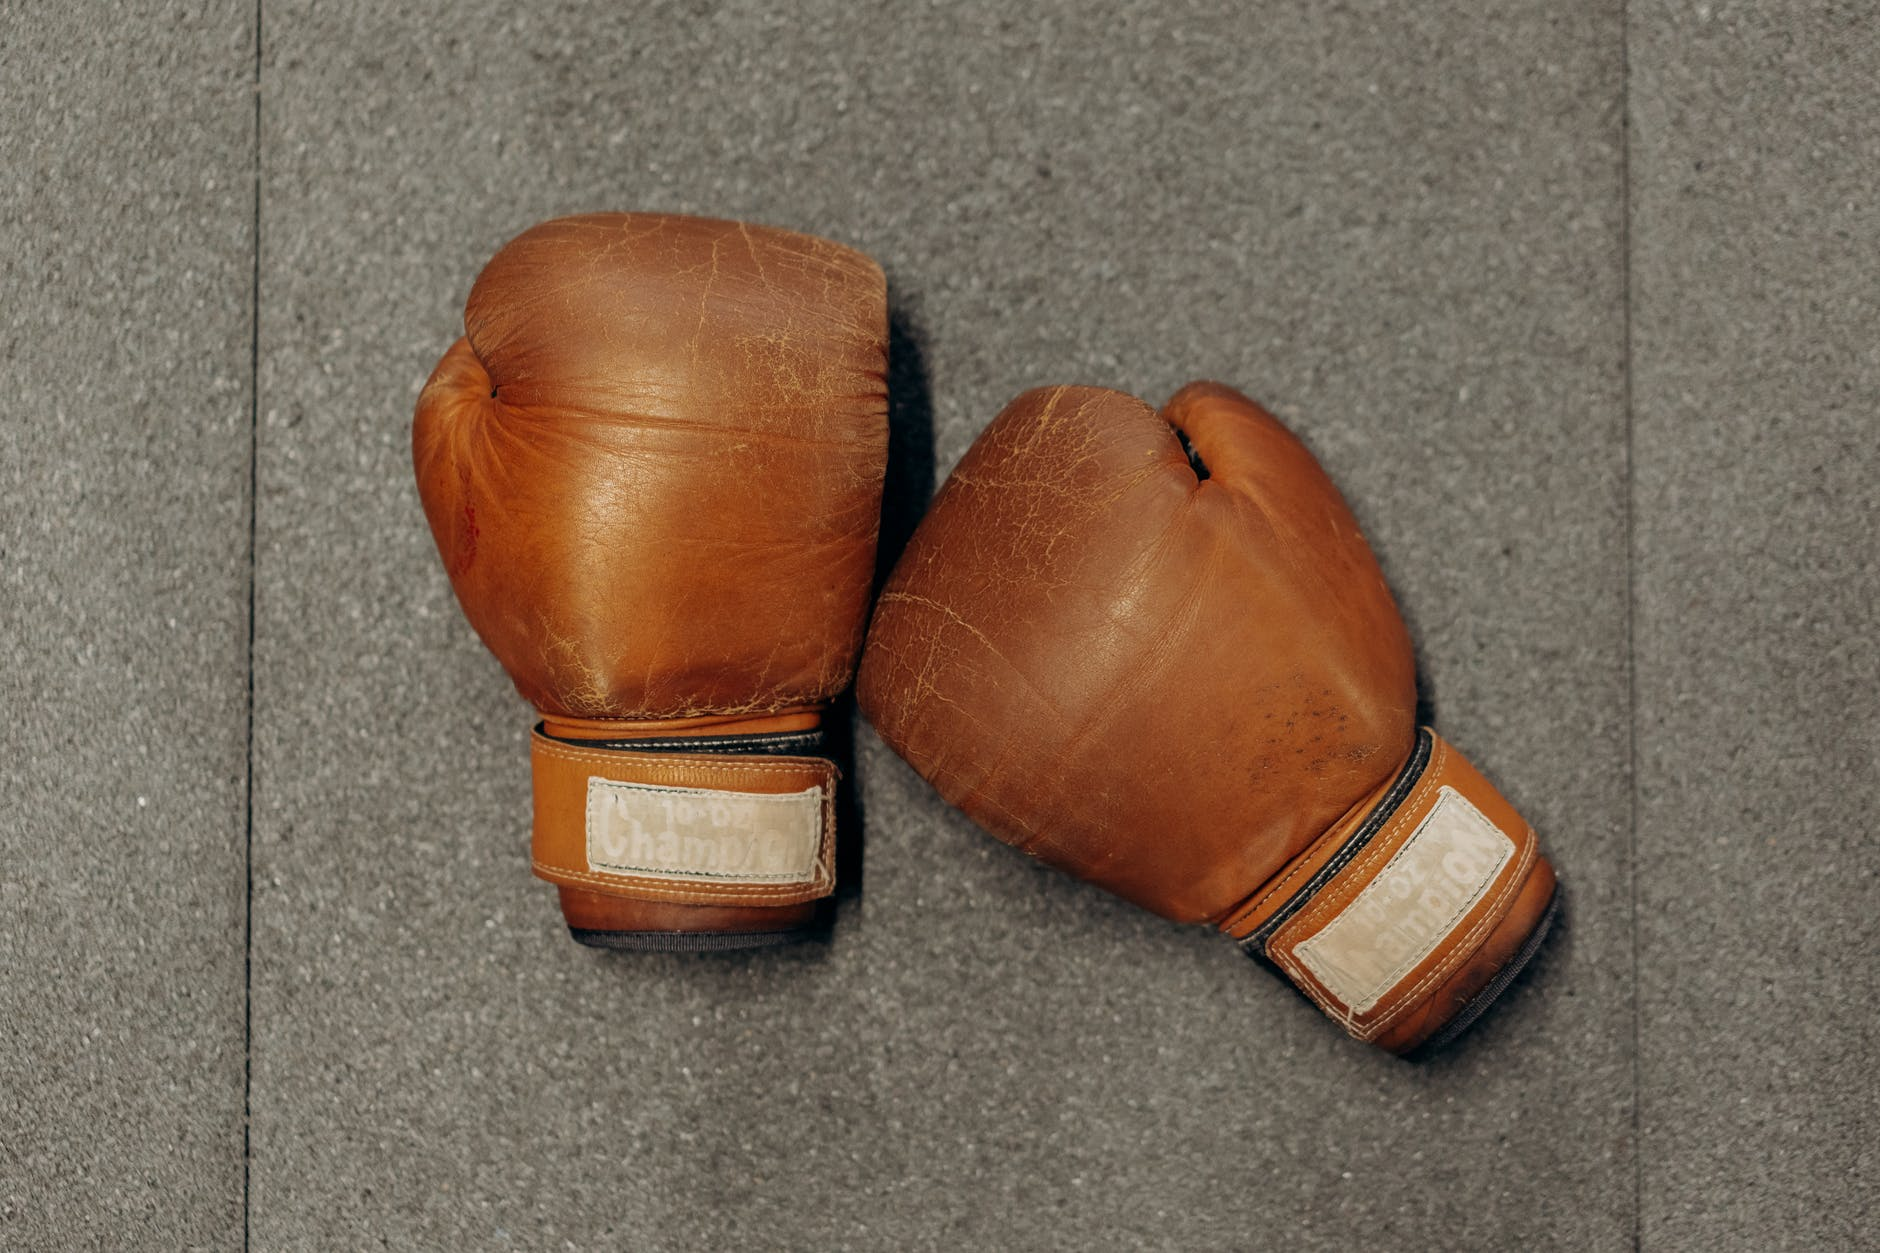 «Битва кочевников»: В Нур-Султане определят соперника Канело